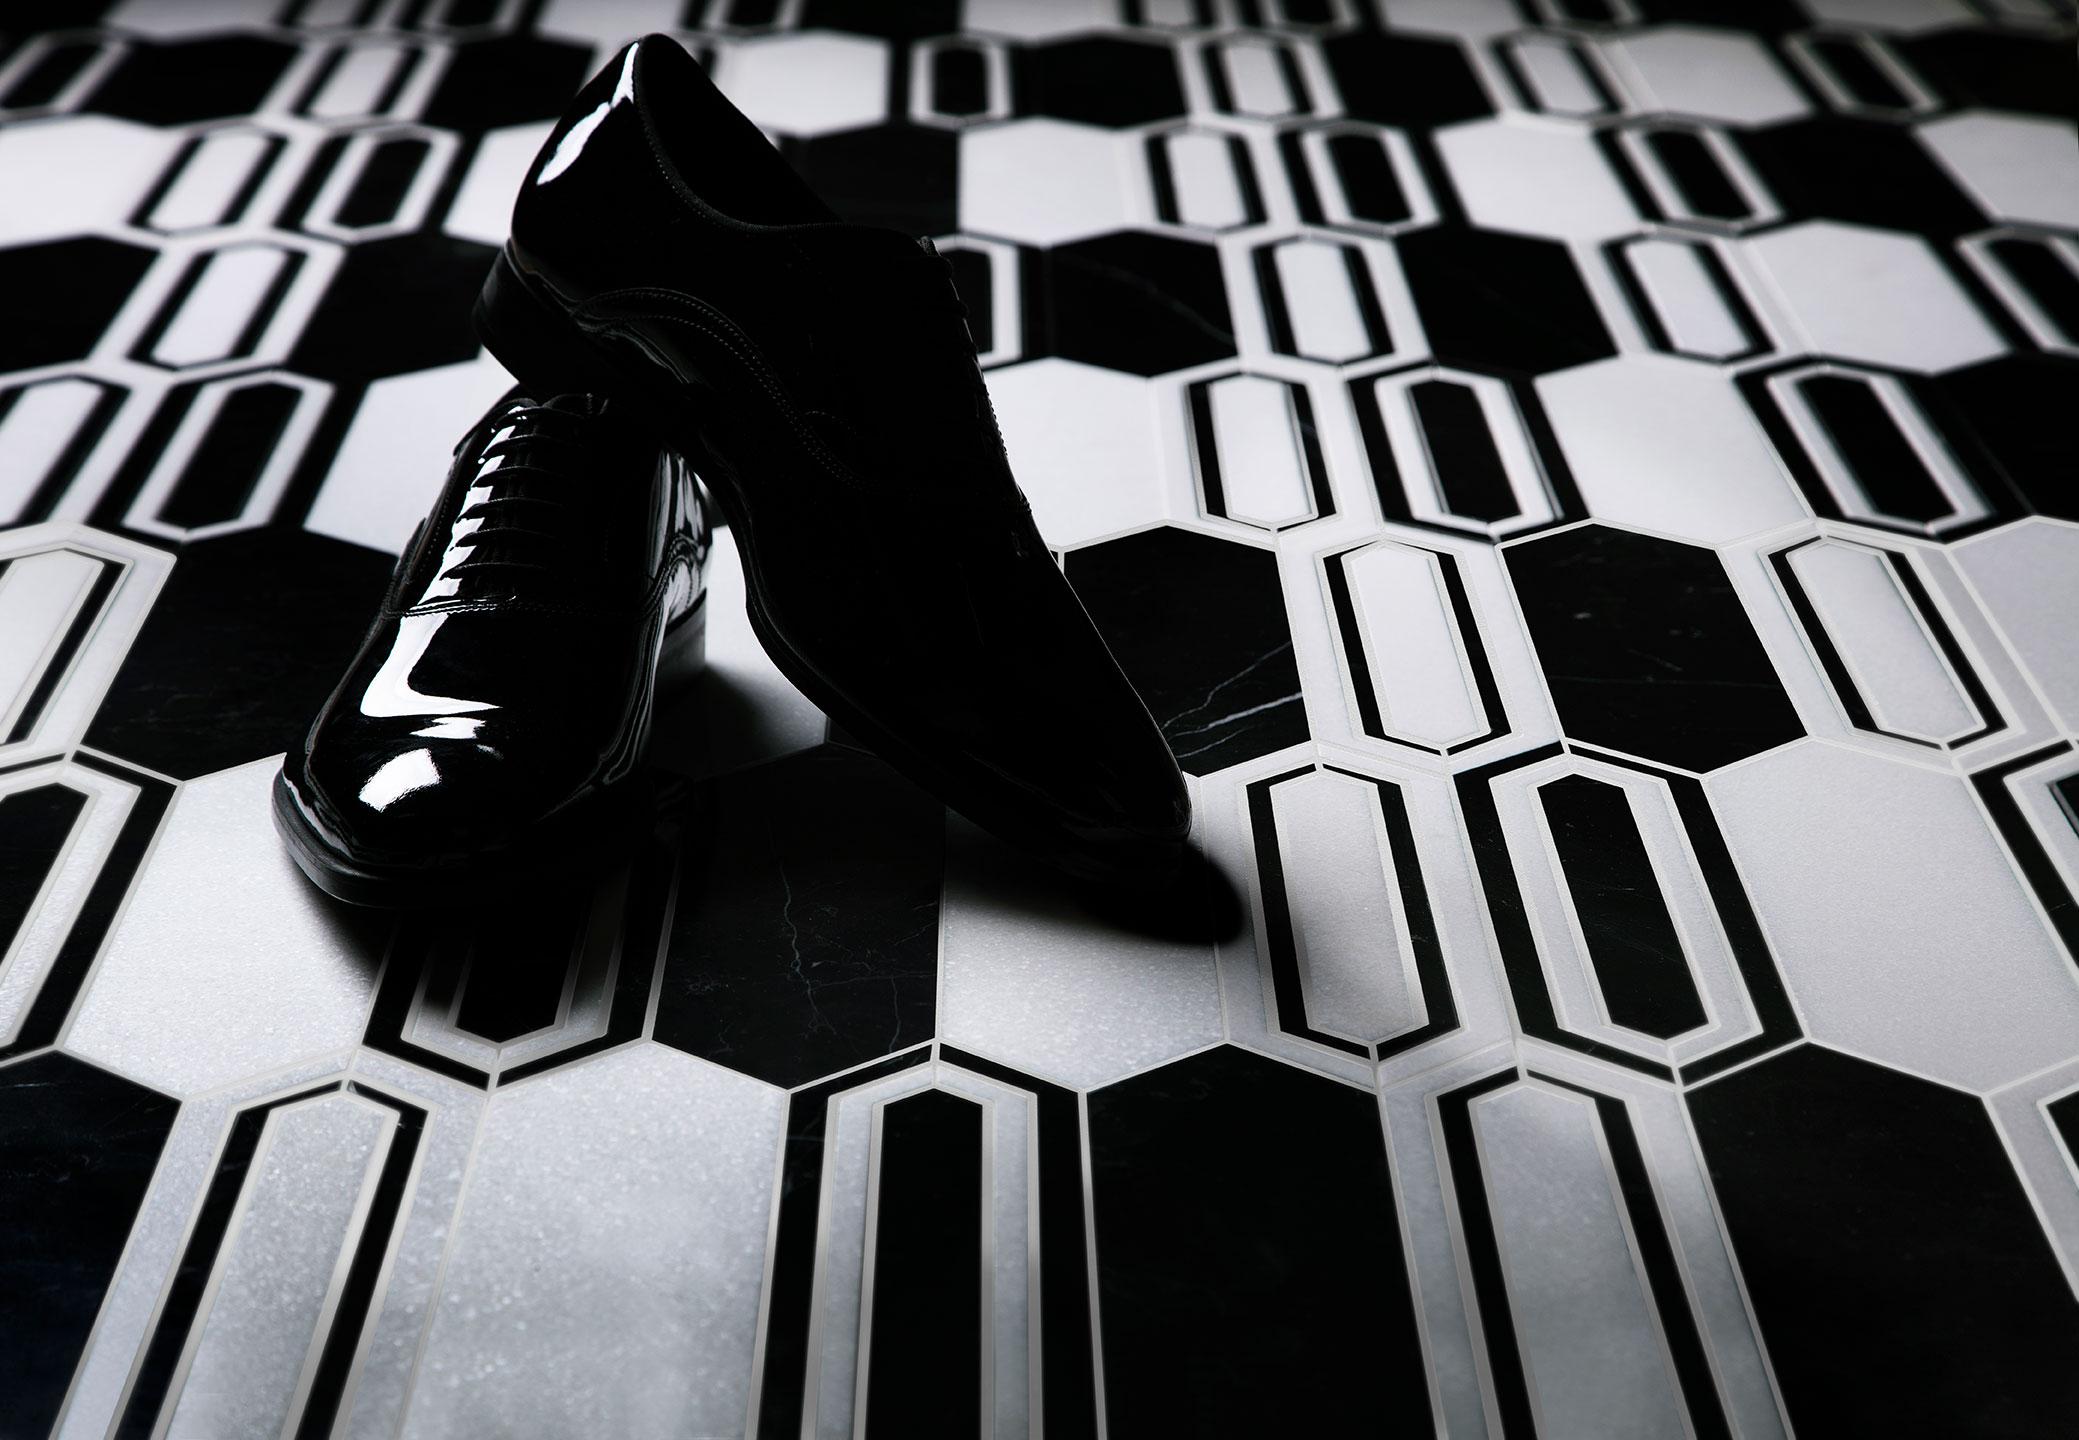 tuxedo shoes black white tile